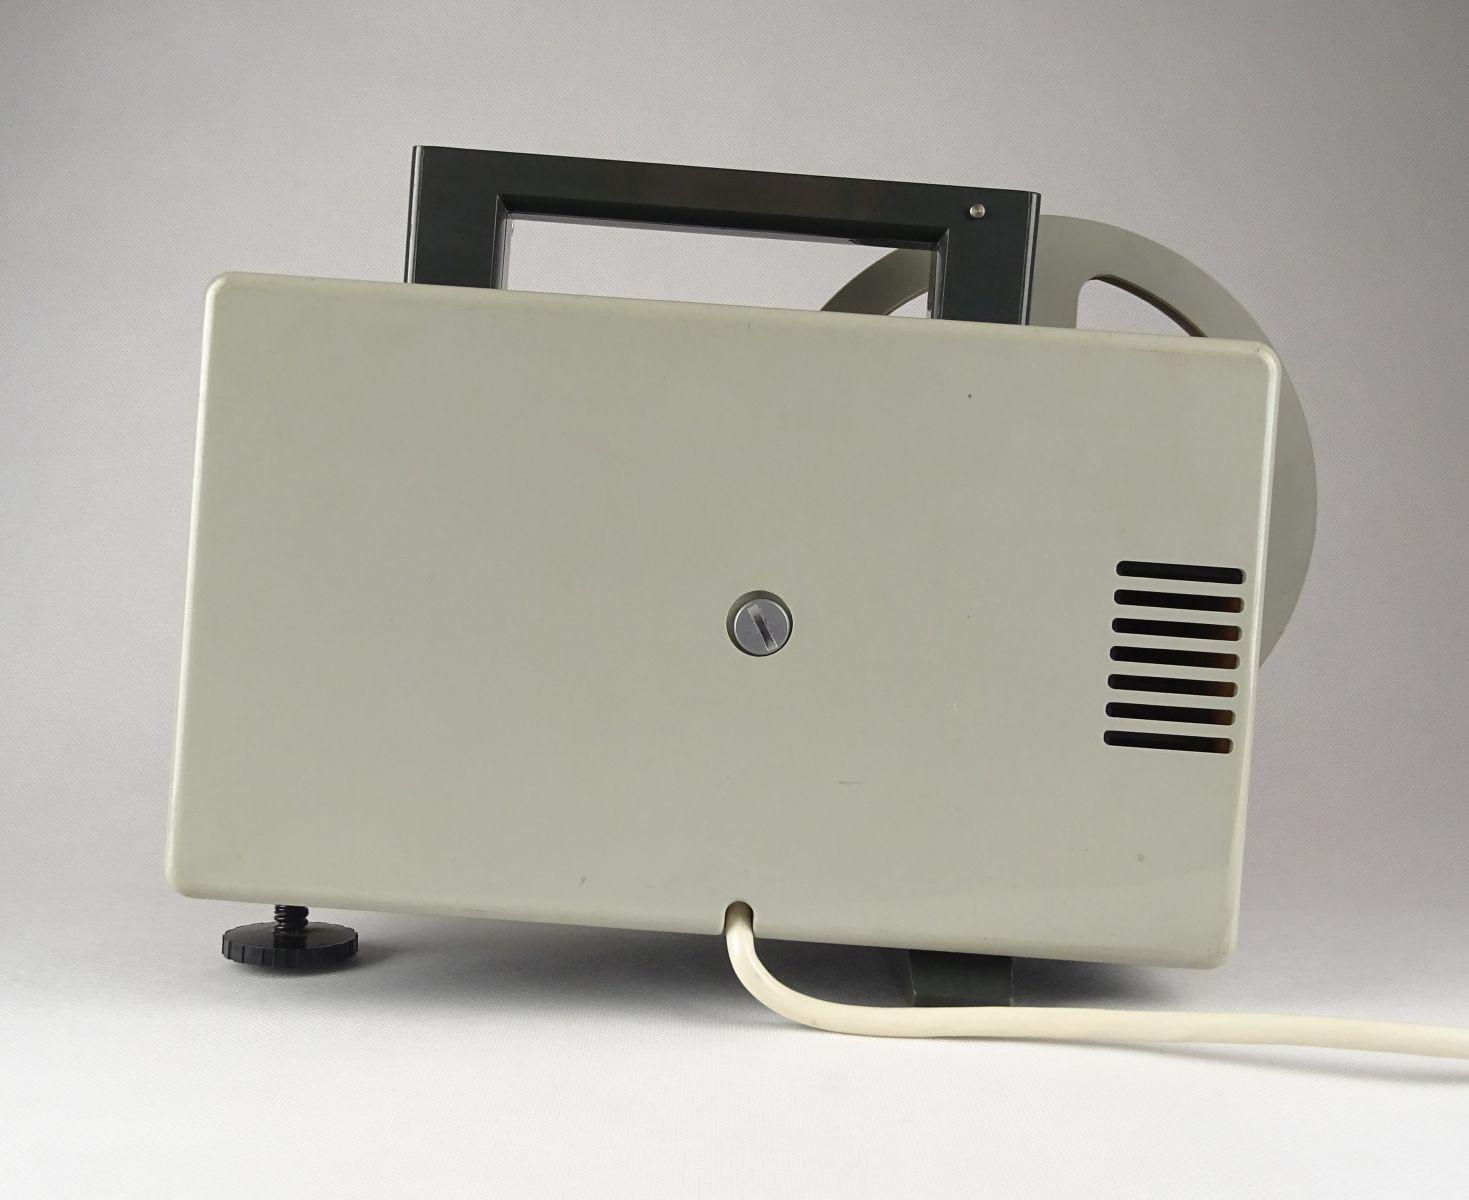 DSC00801.JPG (1469×1200)